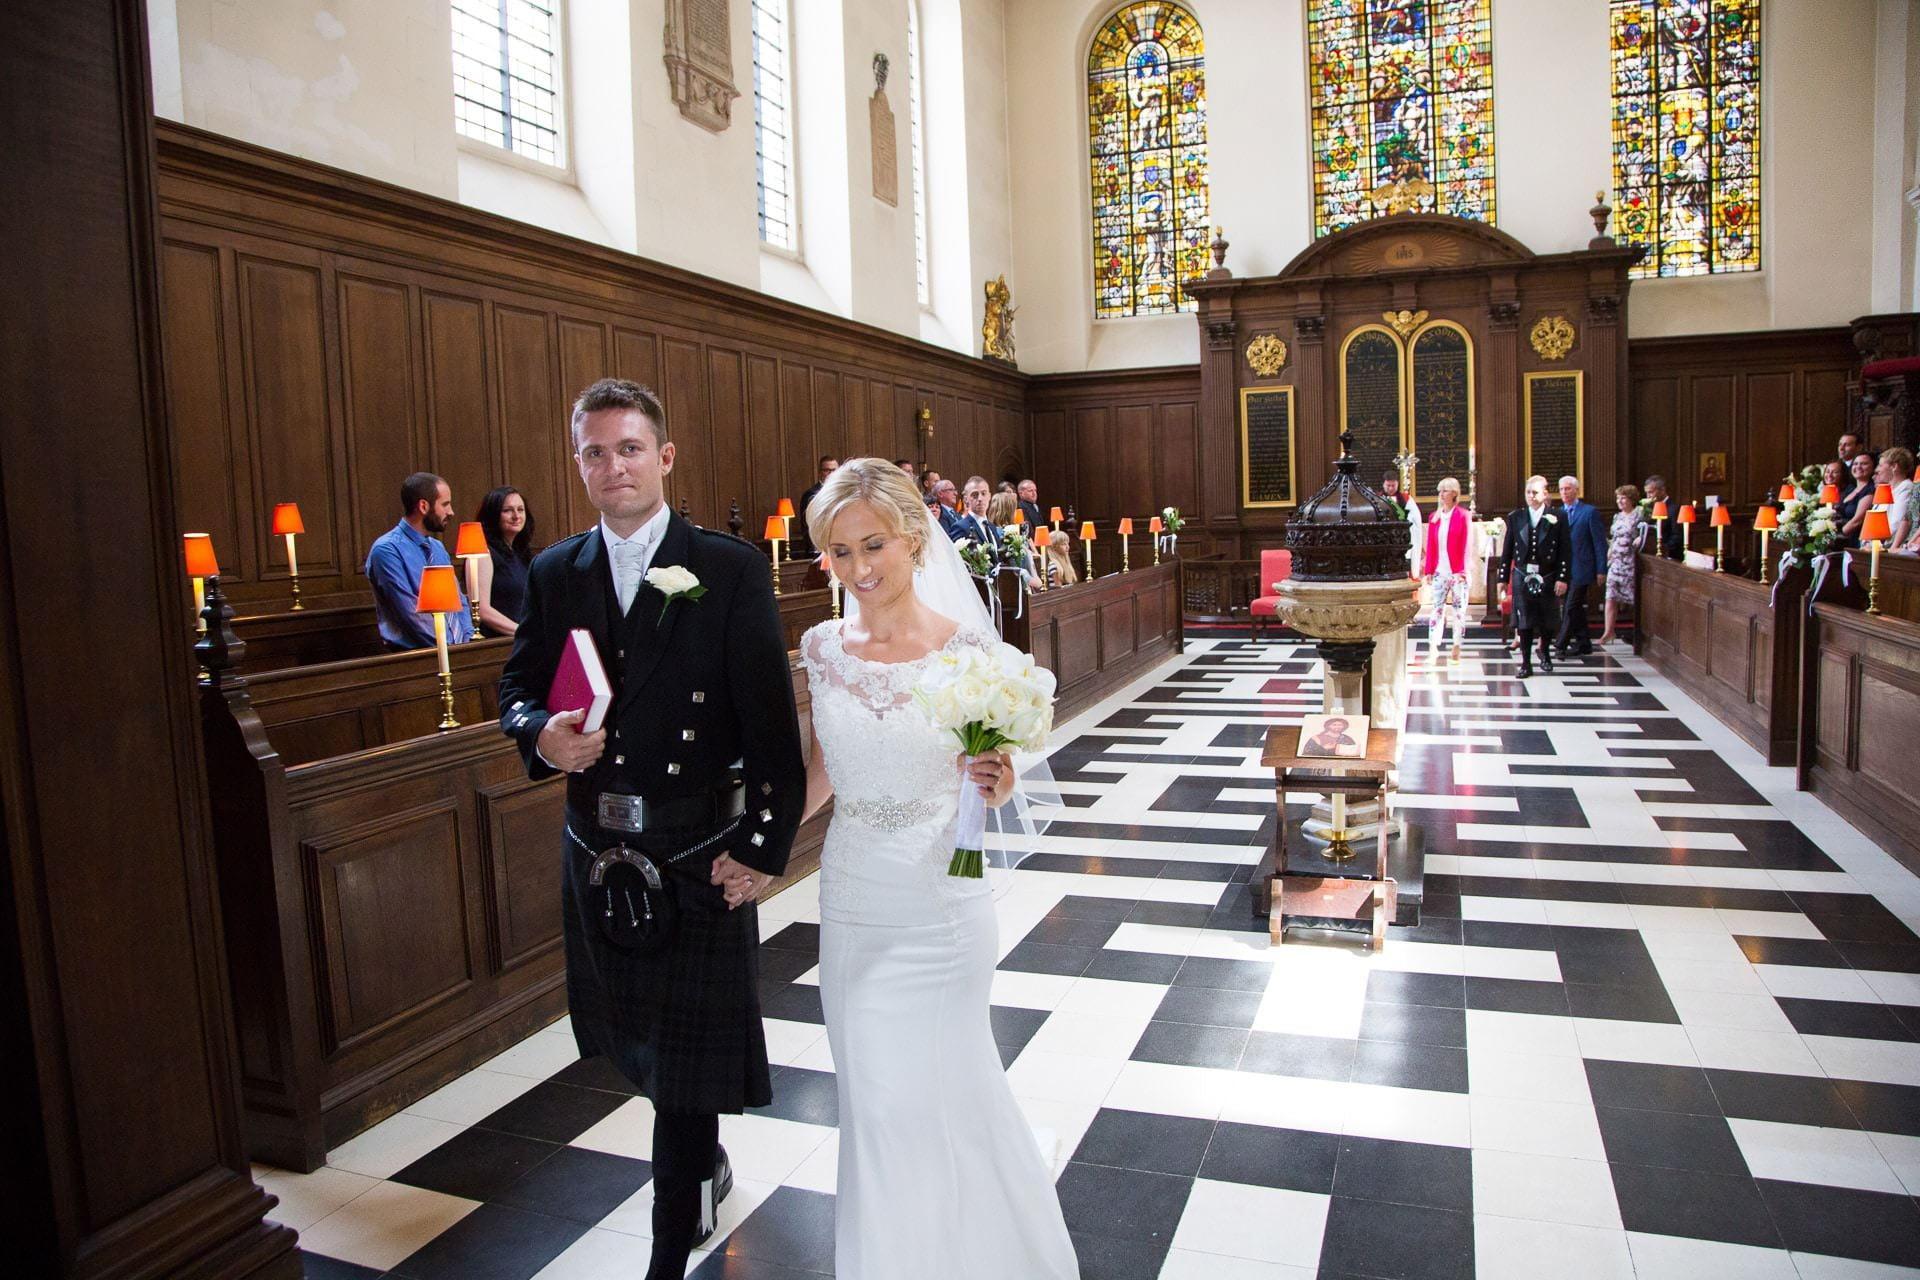 st vedast church wedding